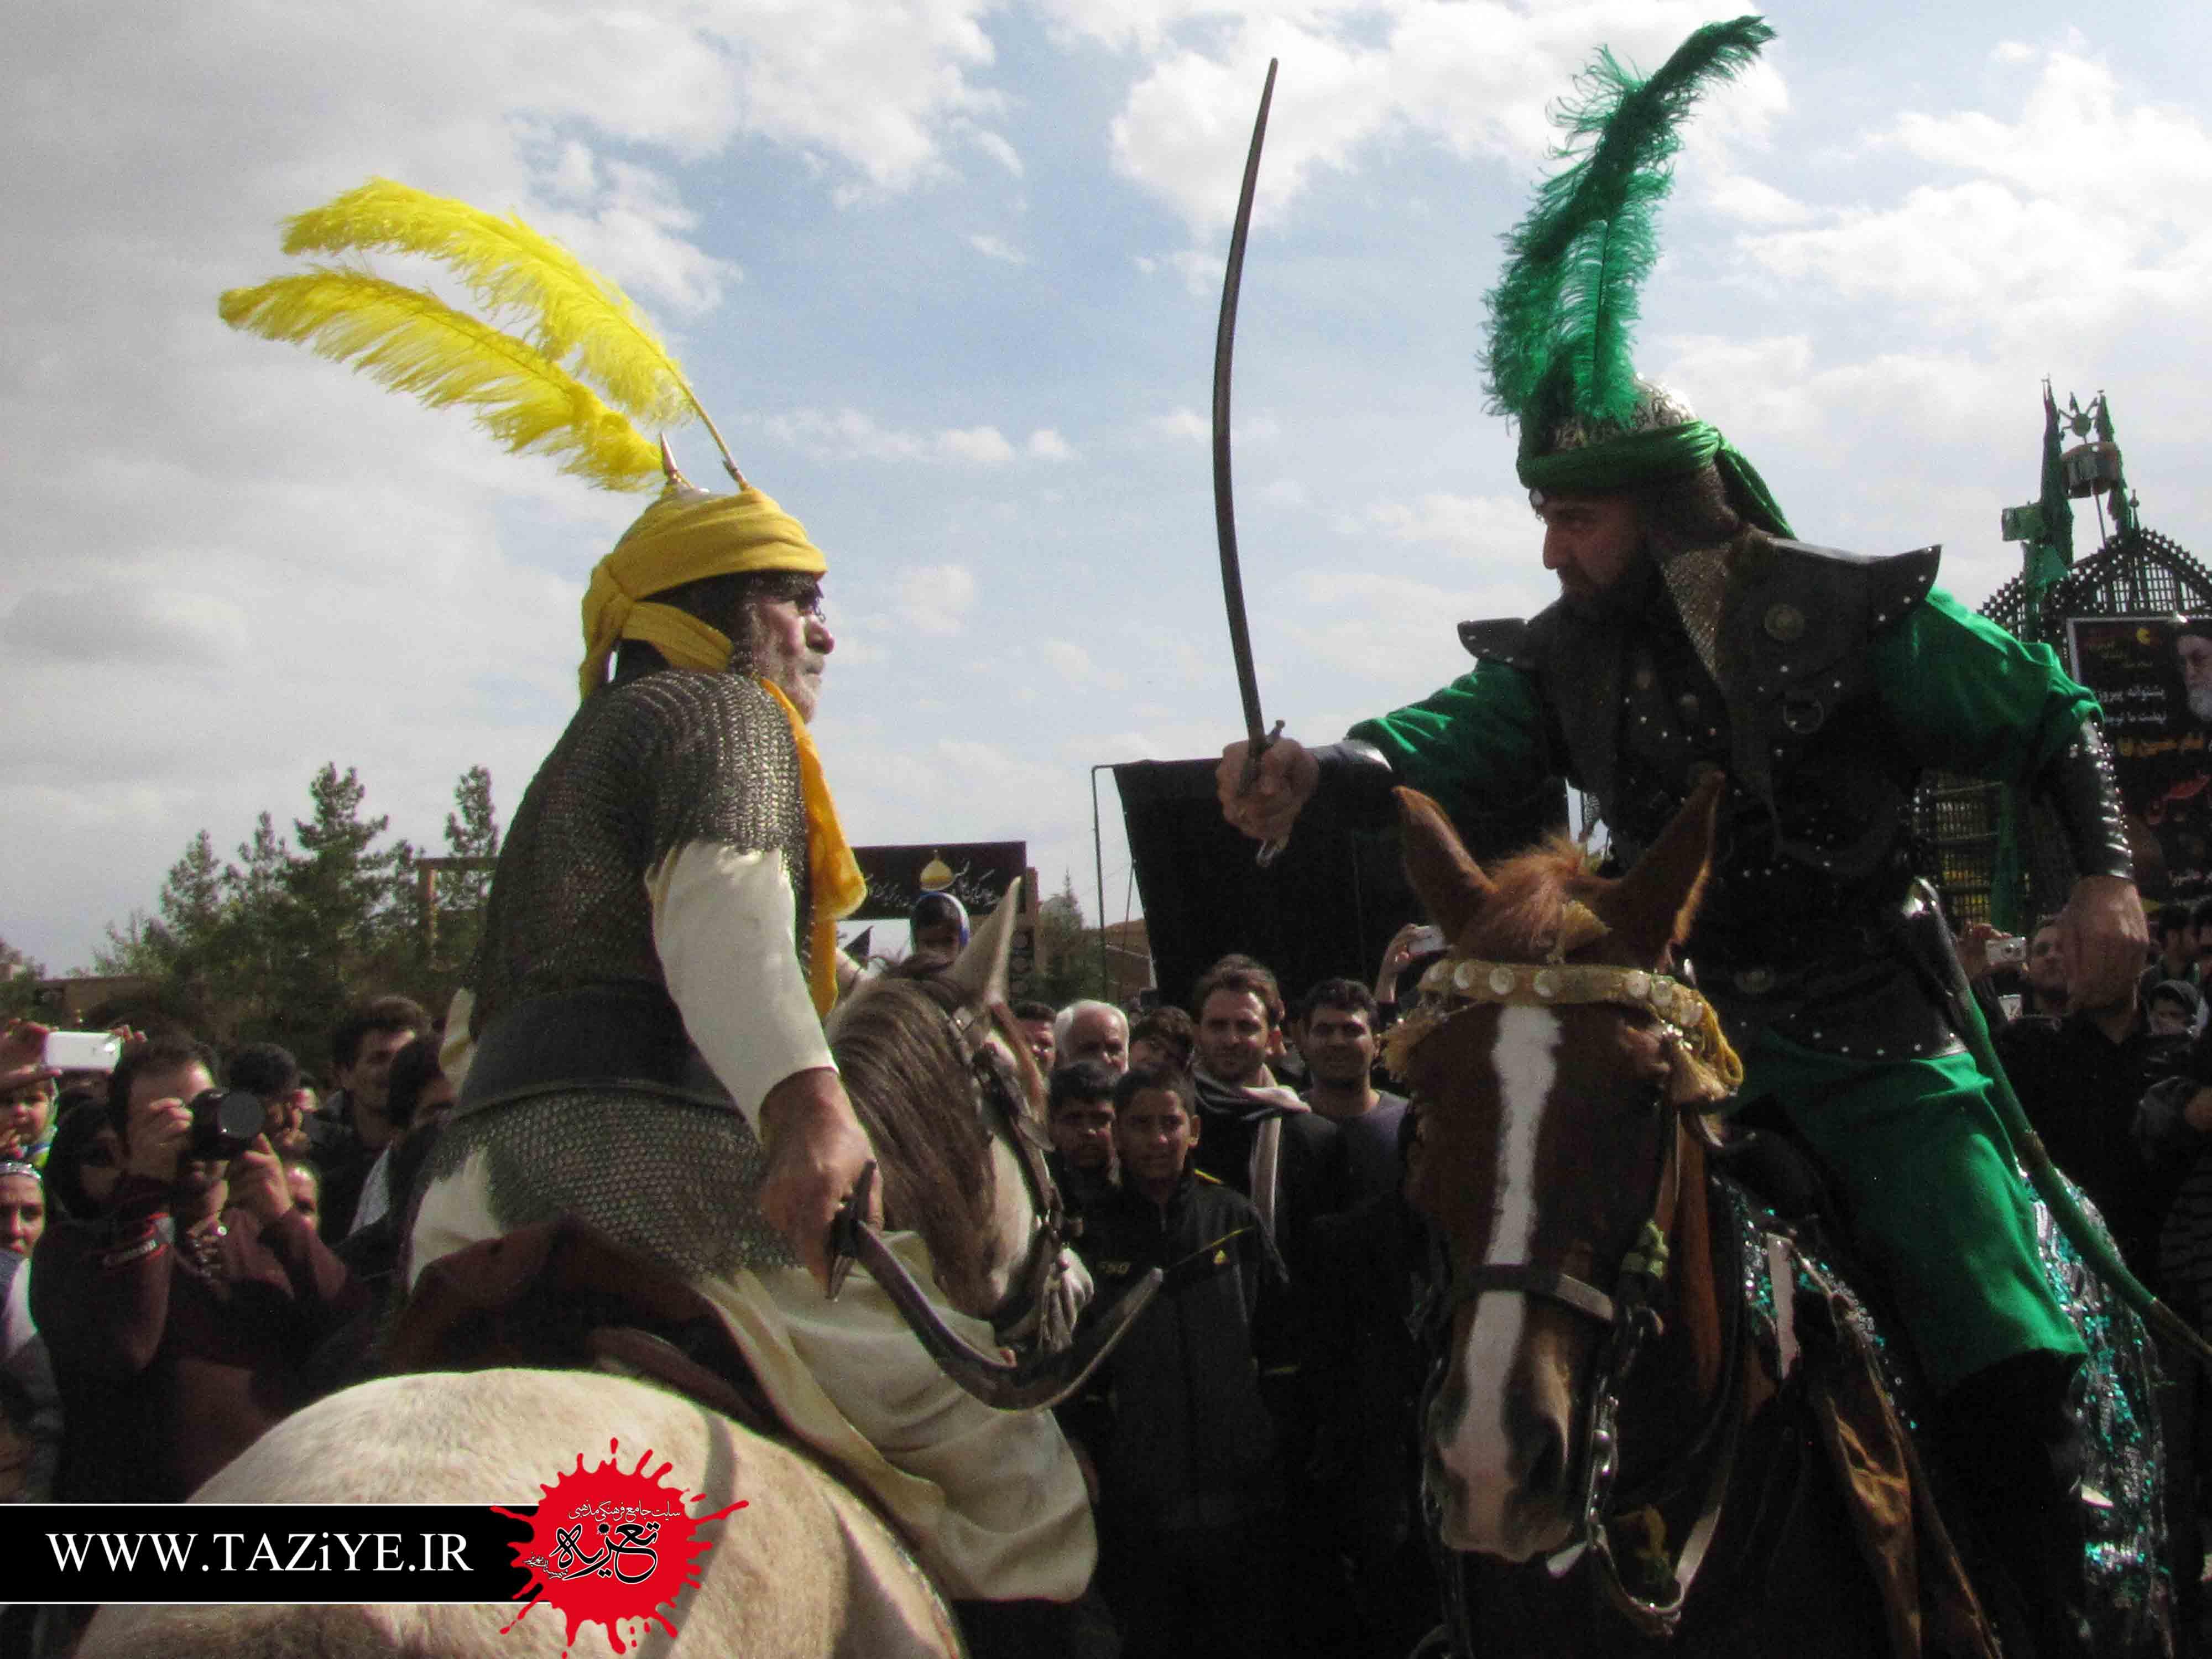 ashura , ashura show , ashura theater , iran street theater, ashura culture